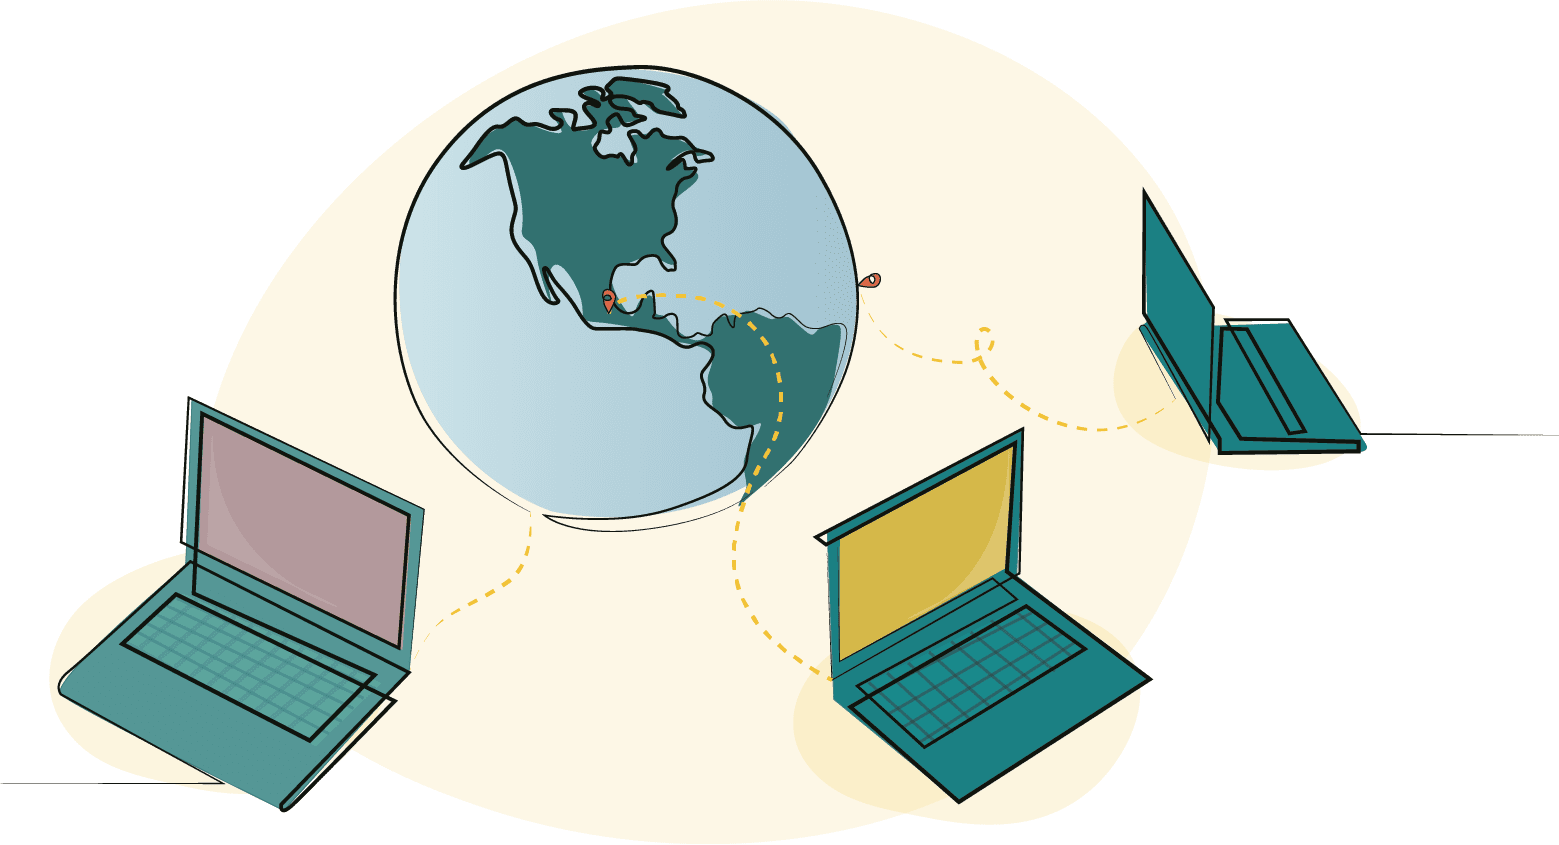 Live locally, work globally